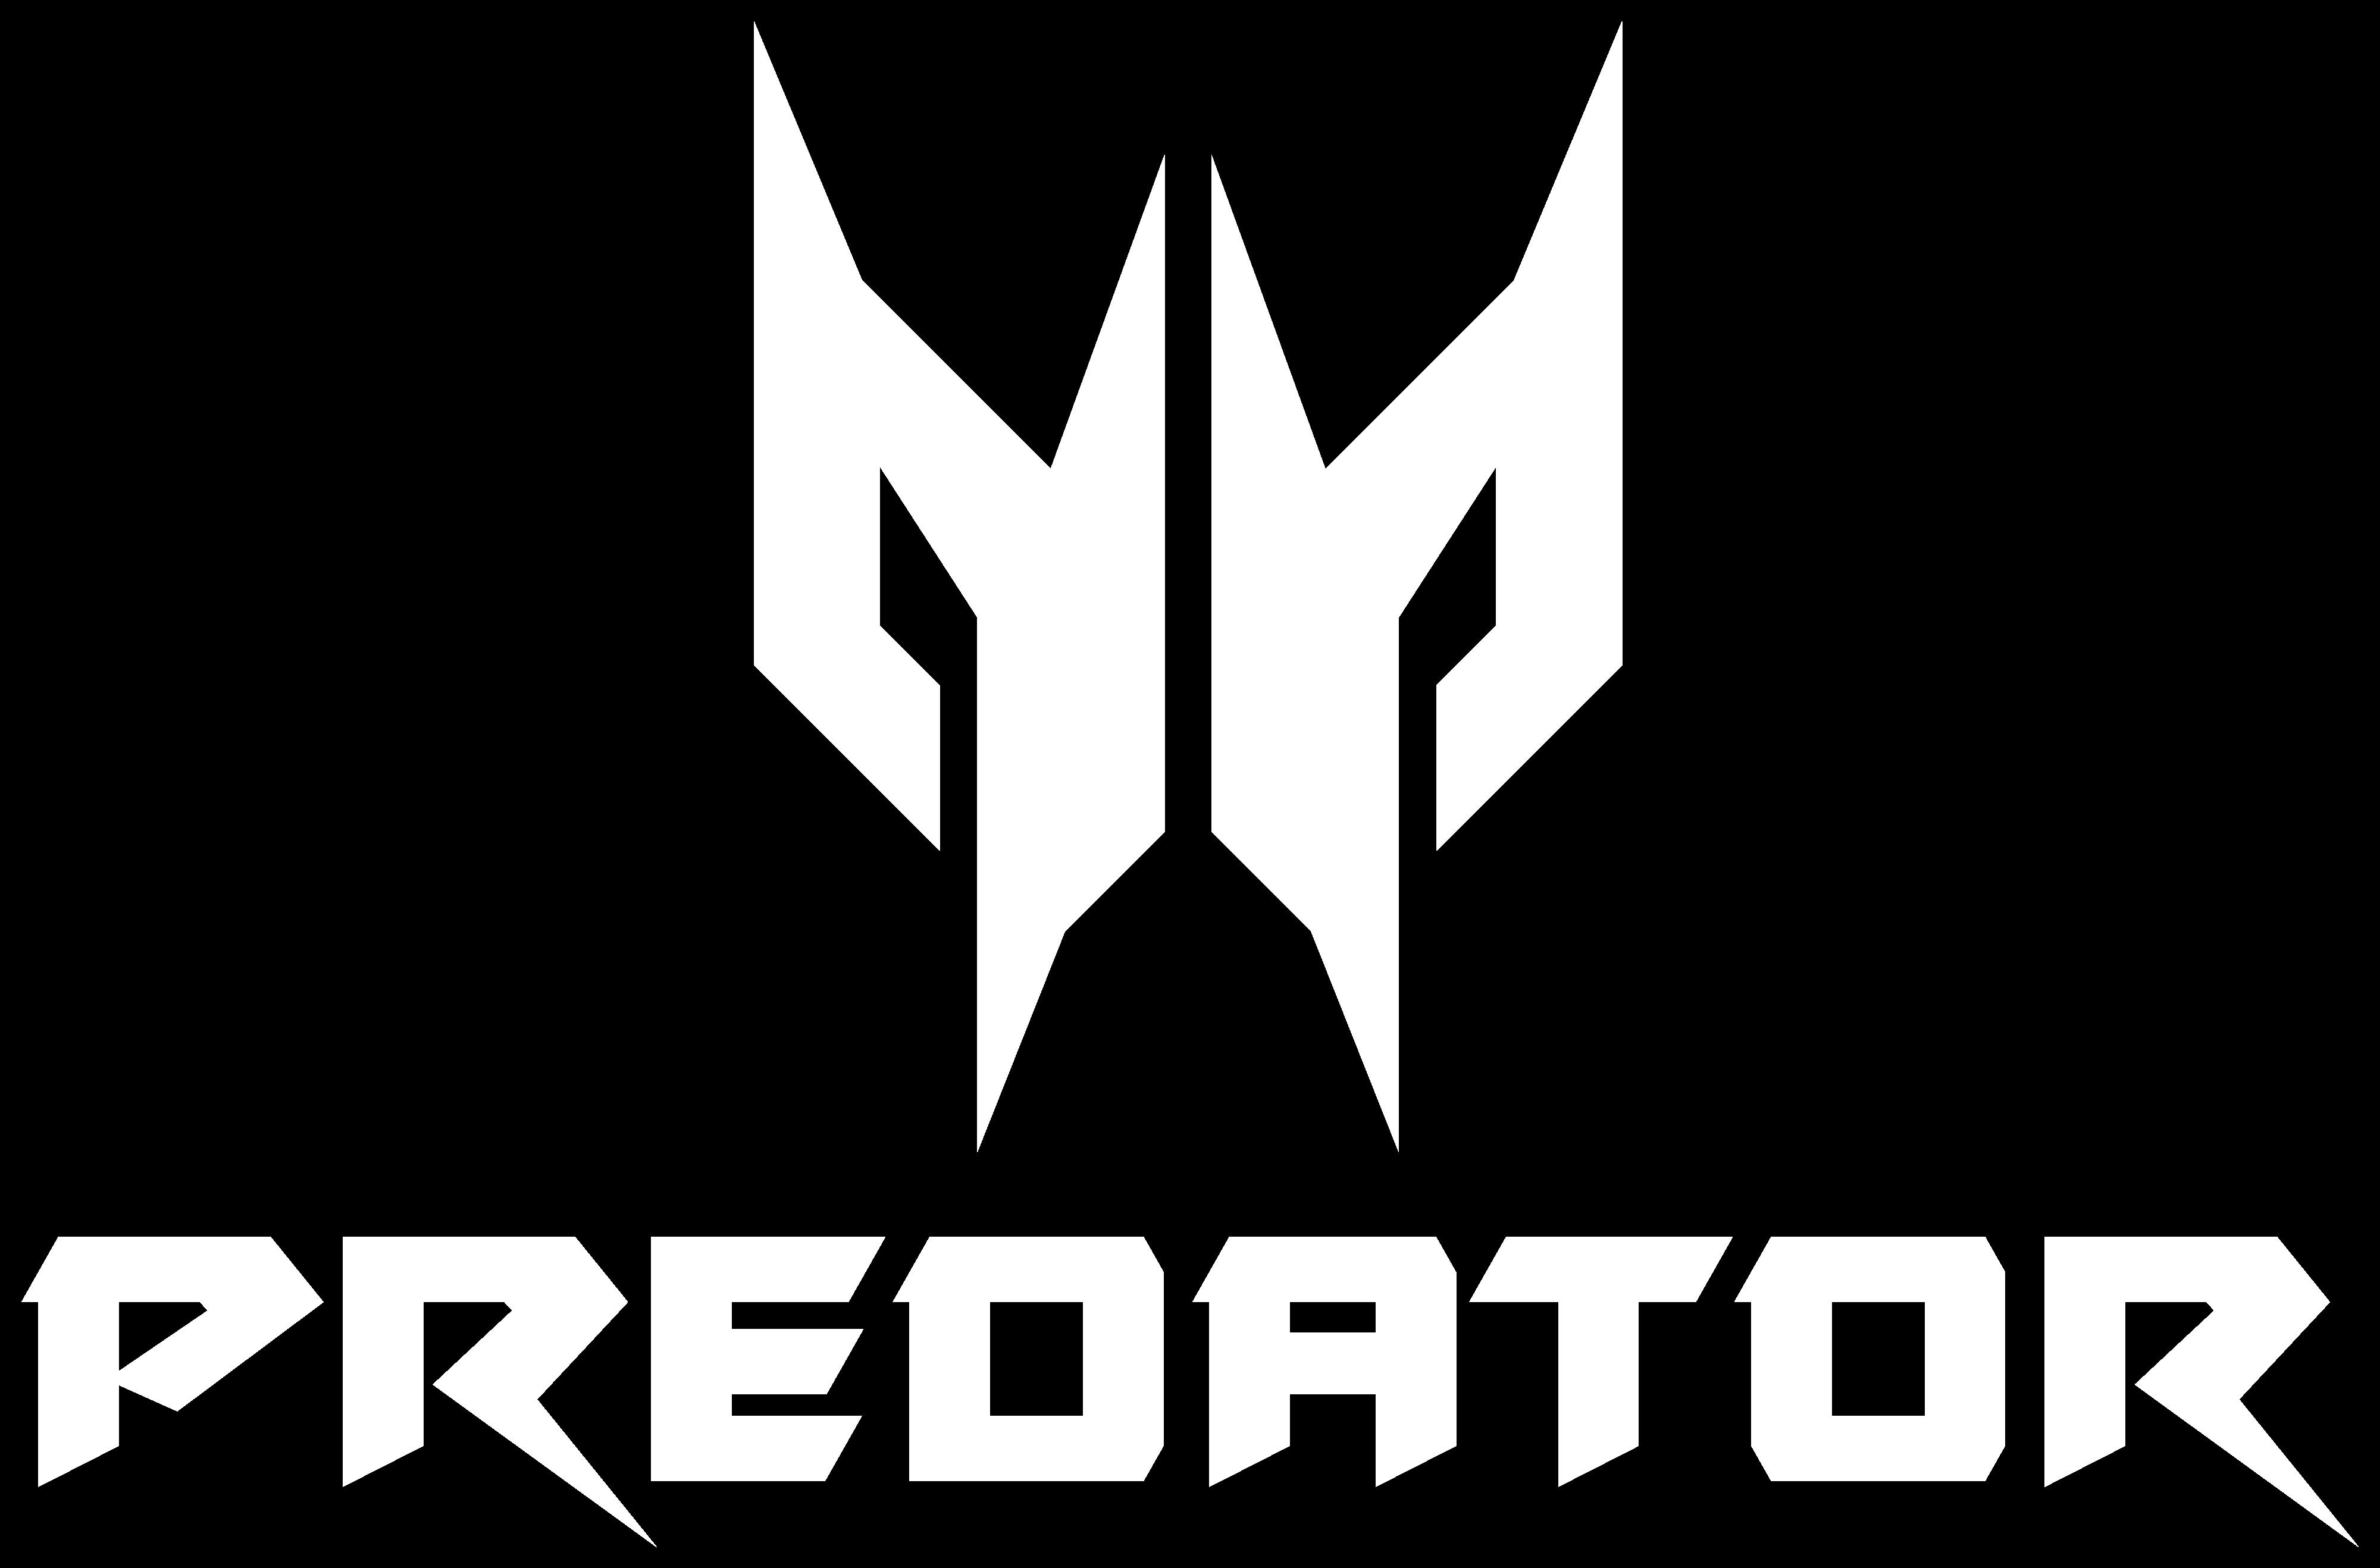 Gaming - Predator y Nitro